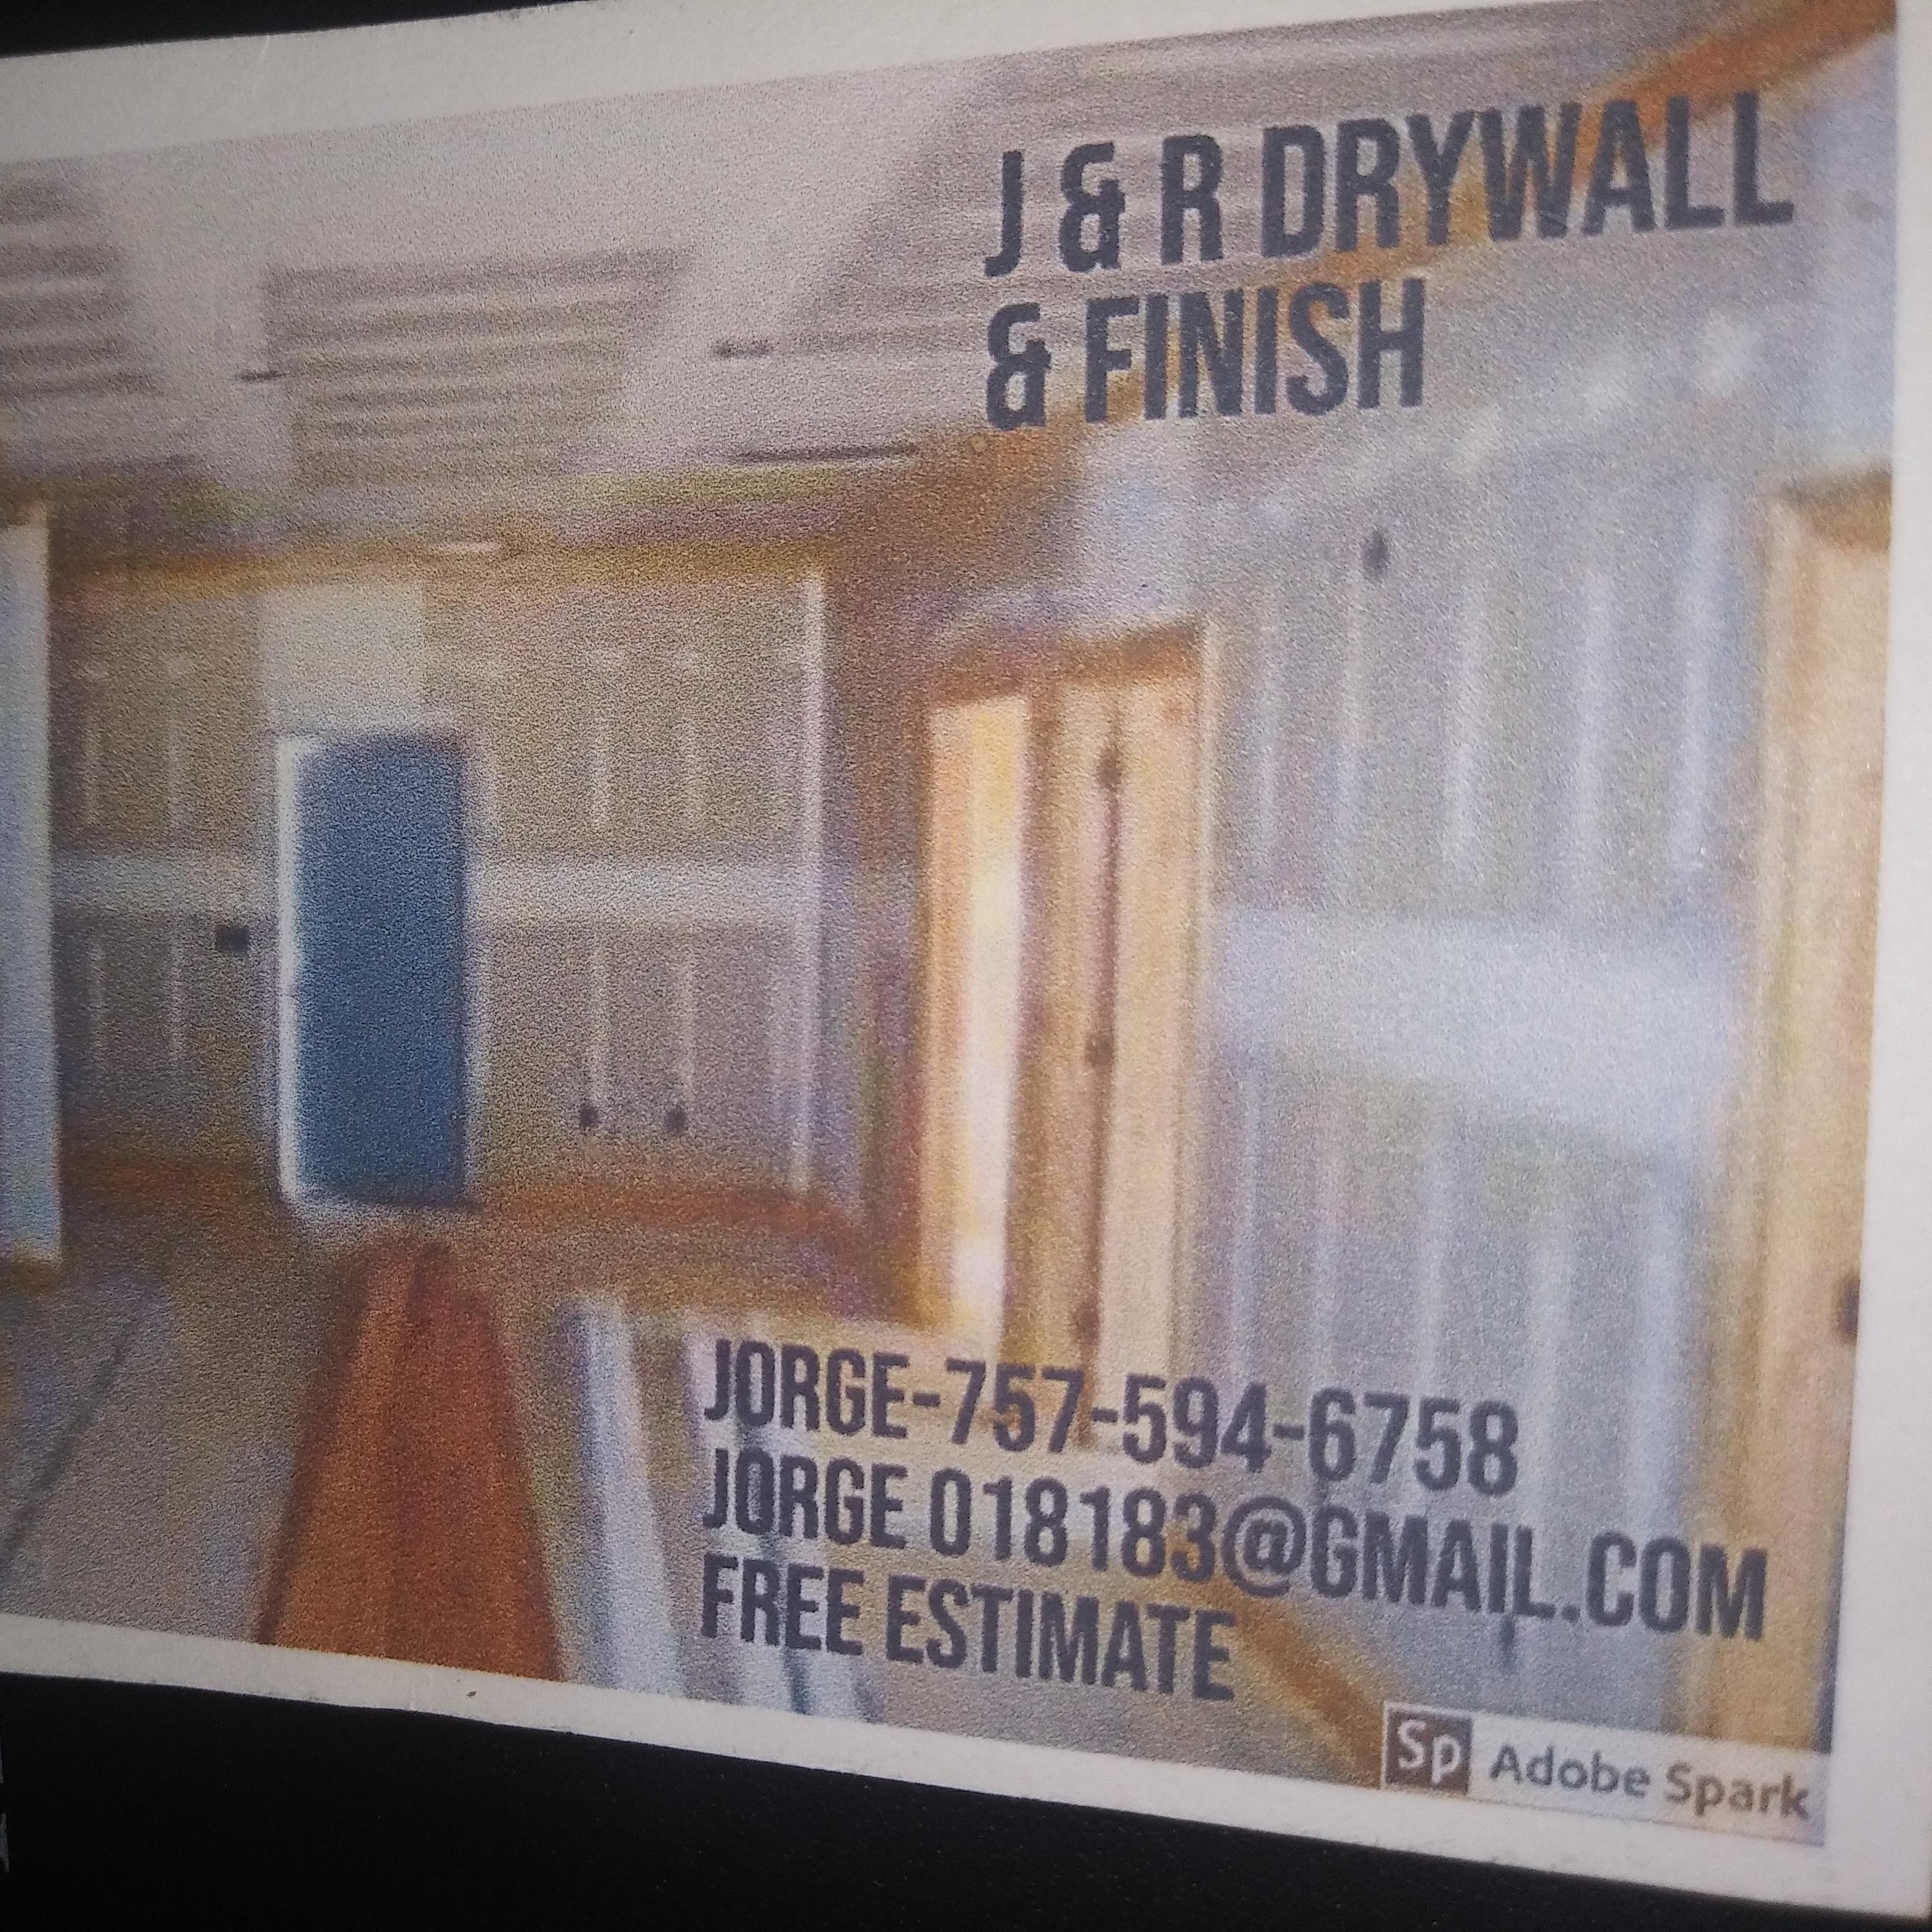 J & R Drywall & Finish